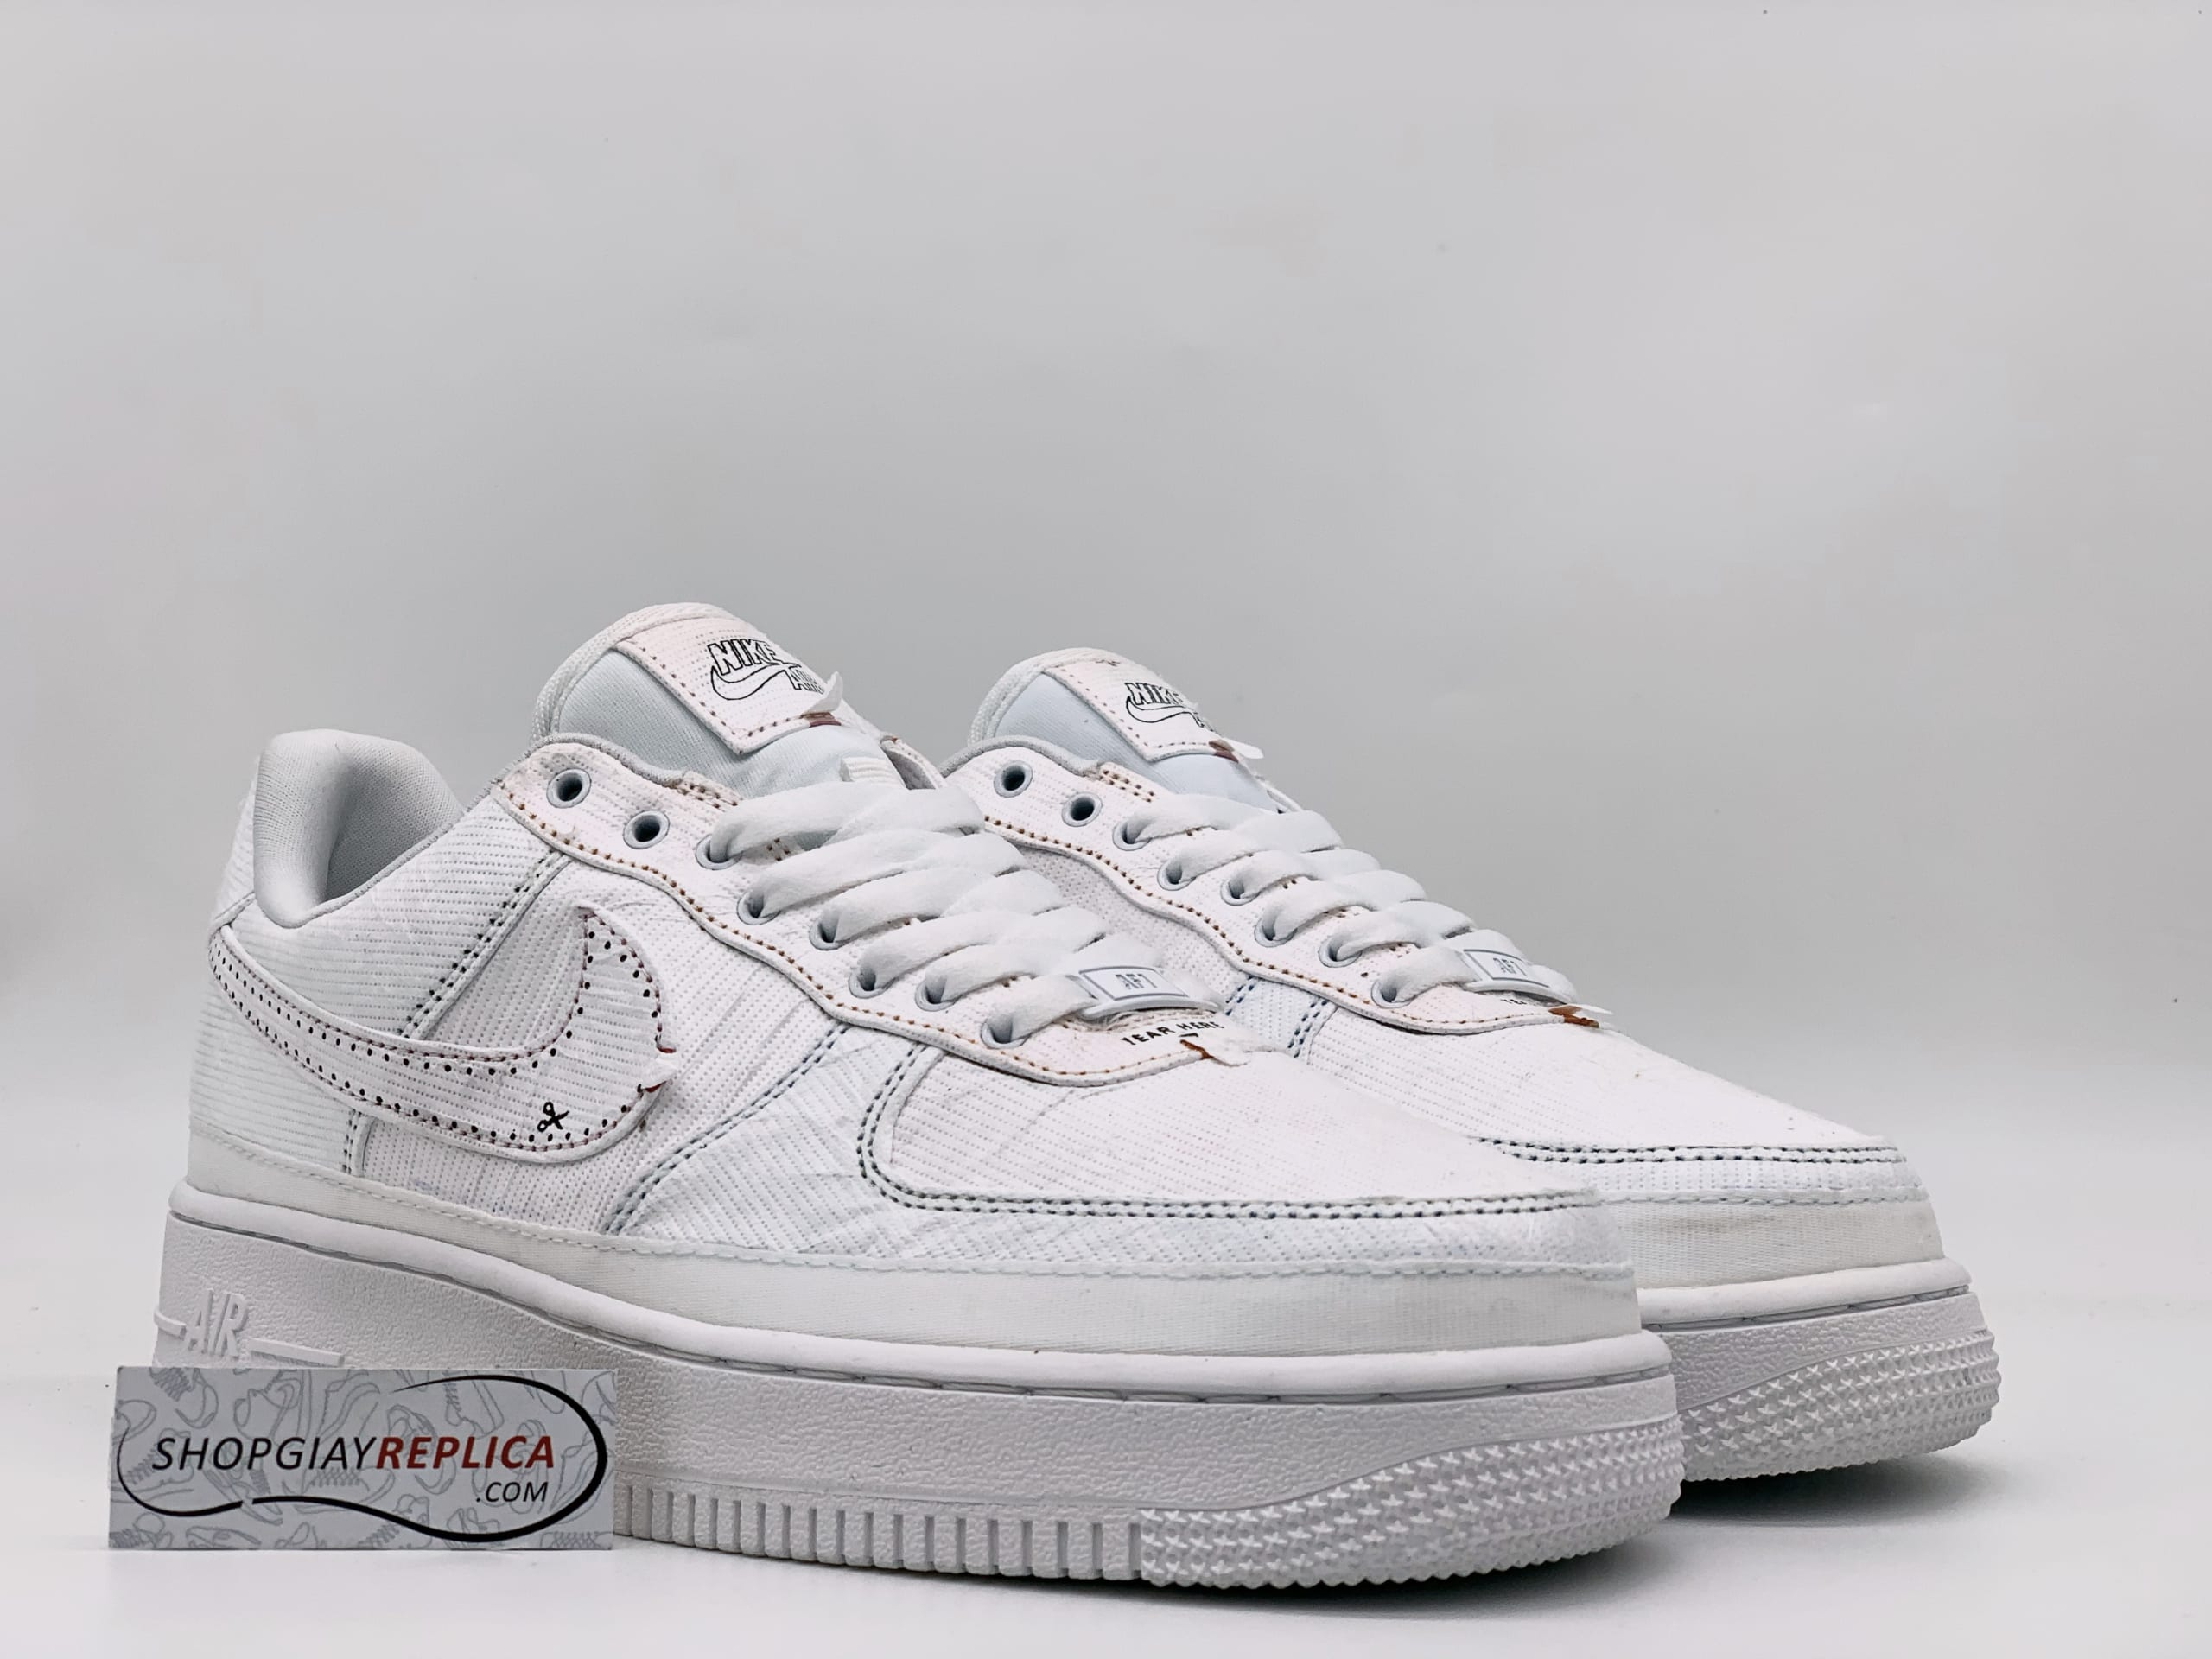 Nike Air Force 1 LX Tear Away Red Swoosh